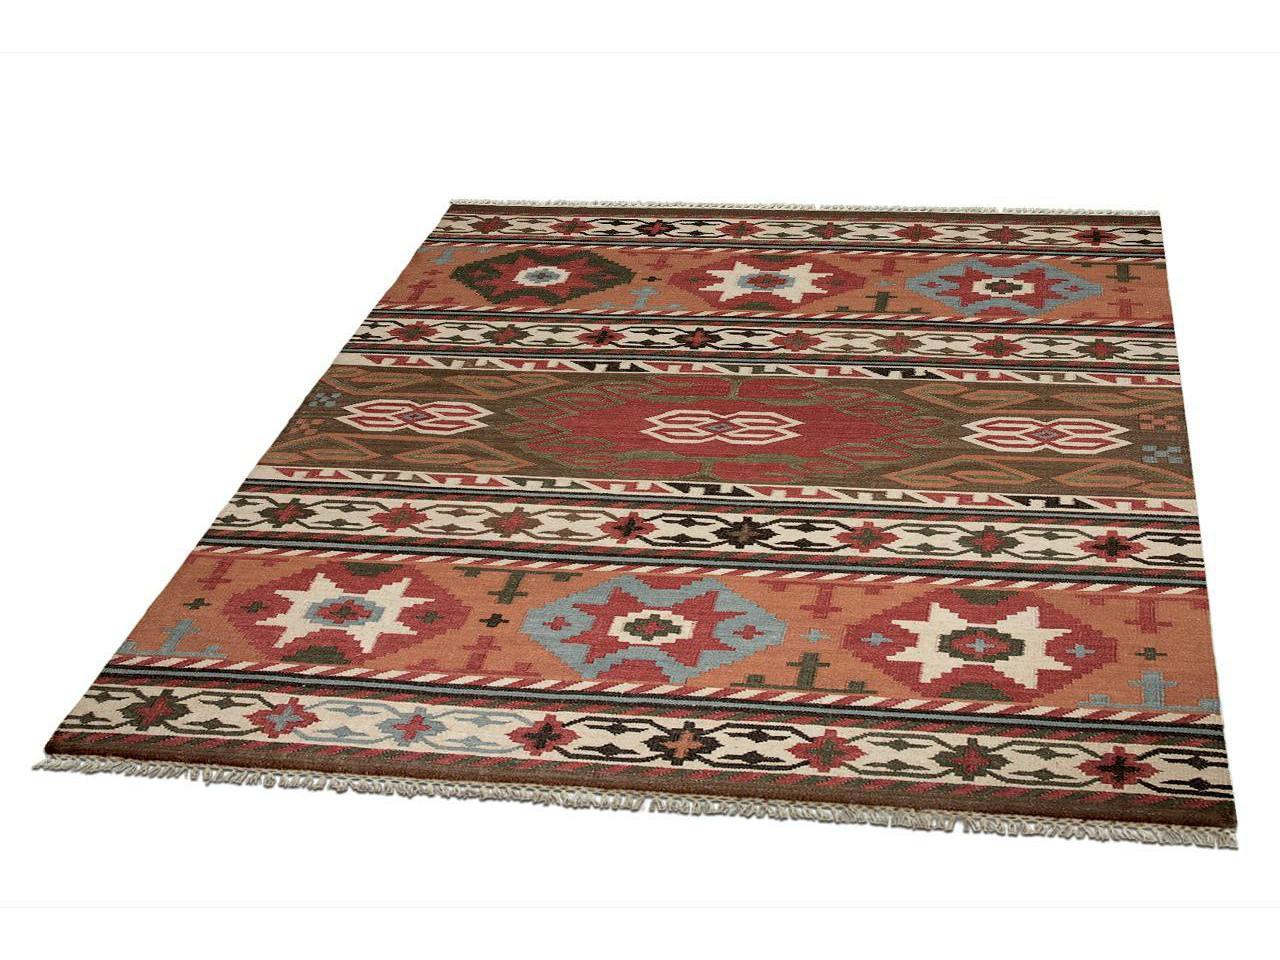 sumak kilim 9158 kilims traditionnels n 1063 300x200cm. Black Bedroom Furniture Sets. Home Design Ideas